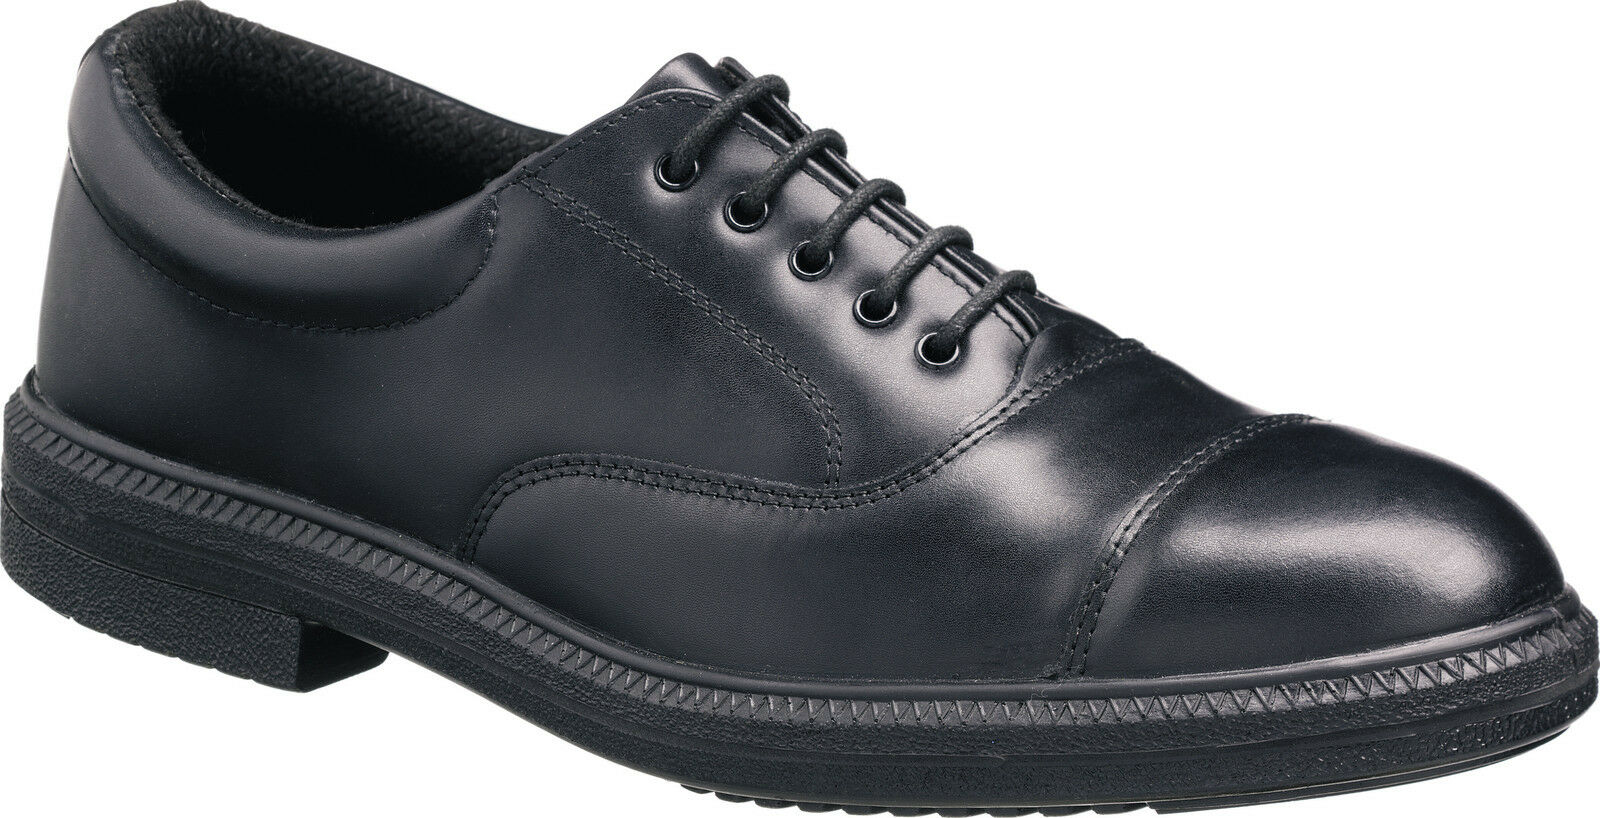 Tuffking 9072 S1P black Puntale D'Acciaio Oxford Direzionale